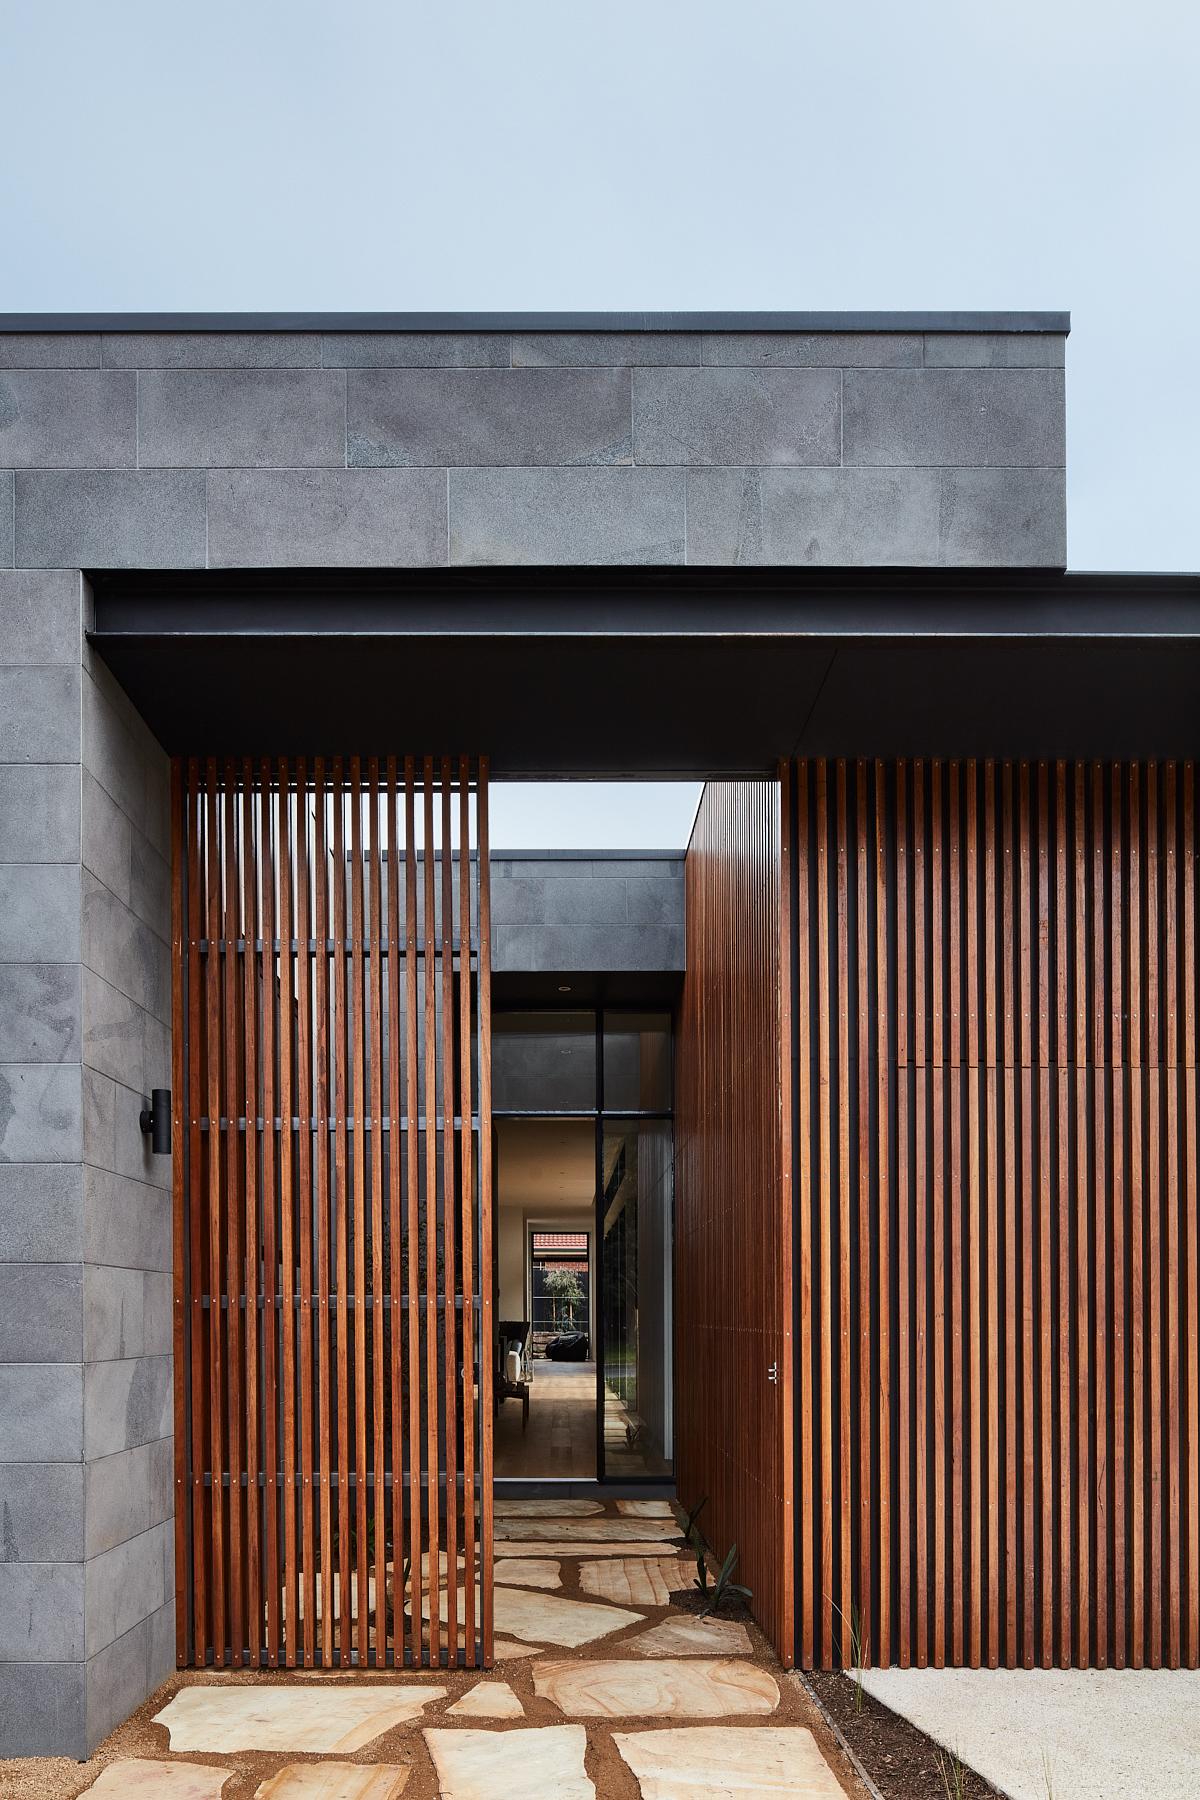 170524-Lifespaces-Courtyardhouse-030.jpg